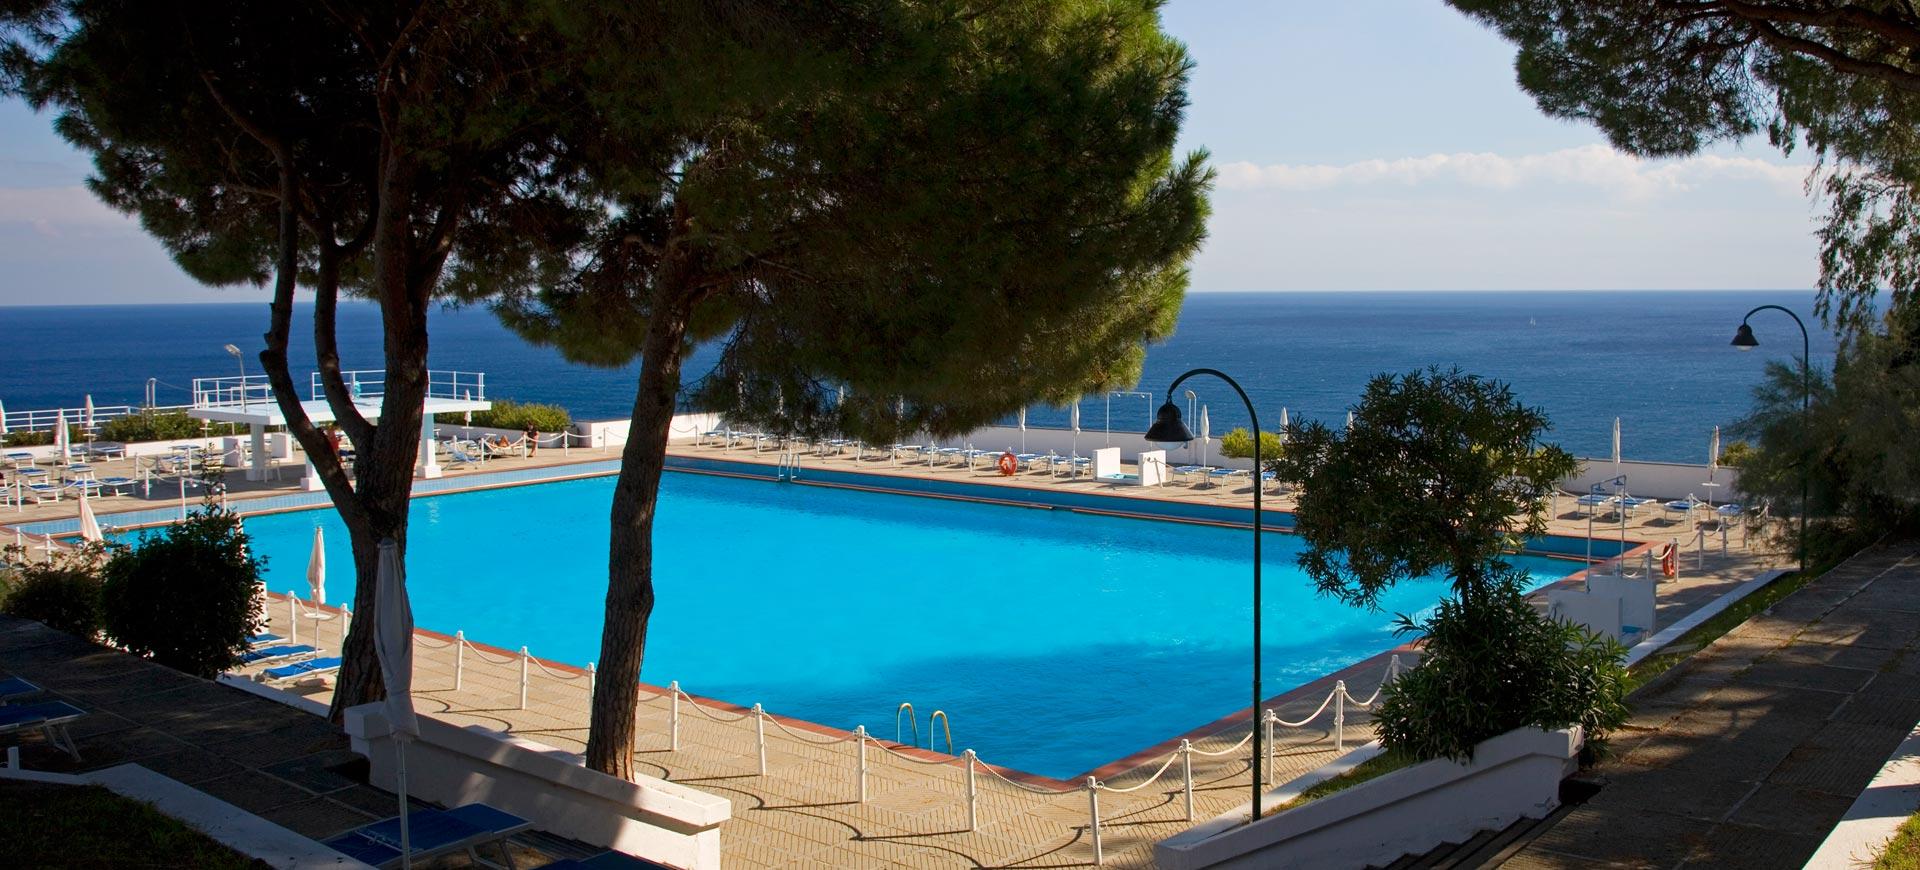 piscine panoramique Arenzano Genova